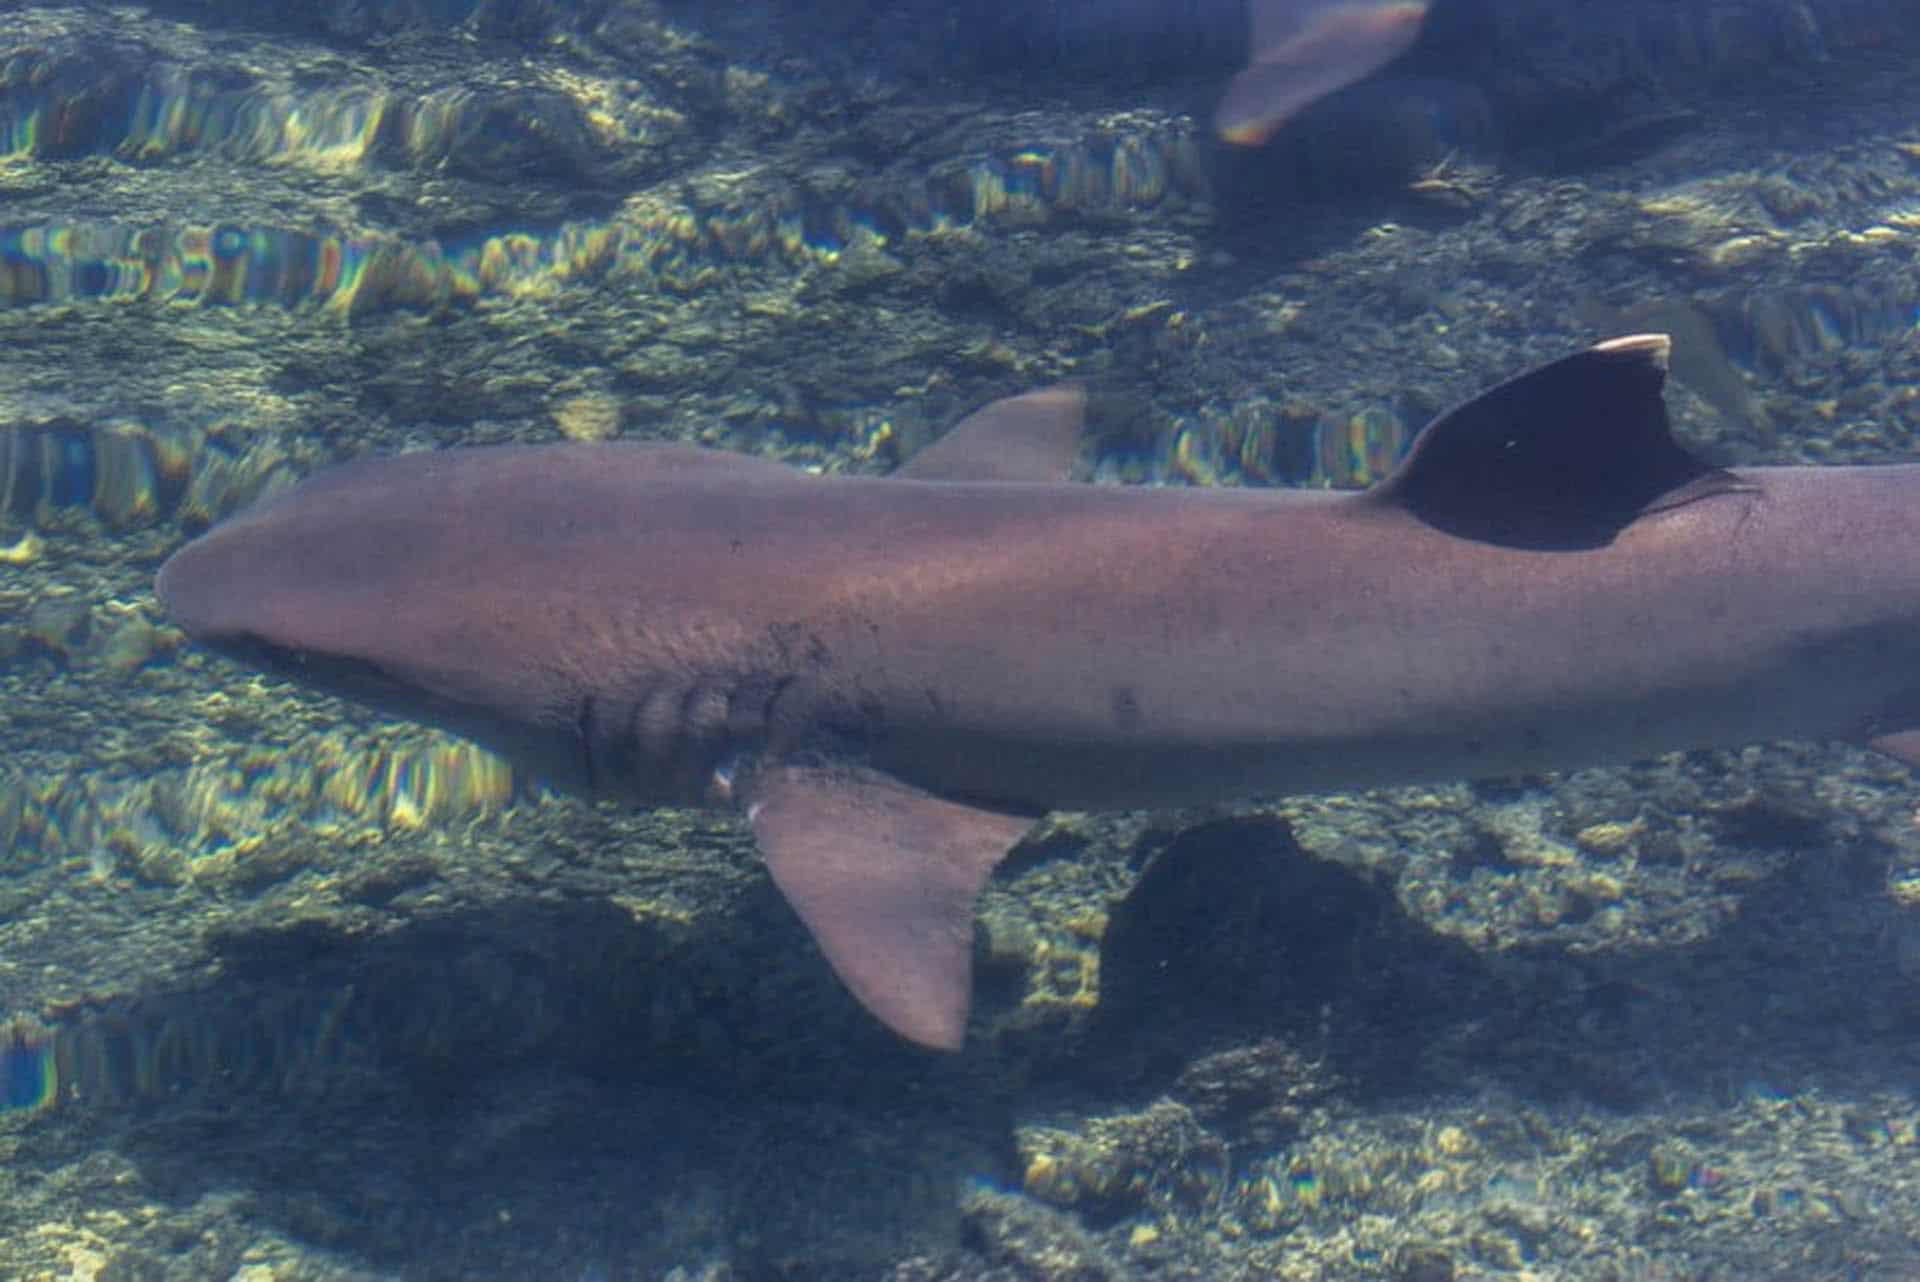 galapagos islands species of shark